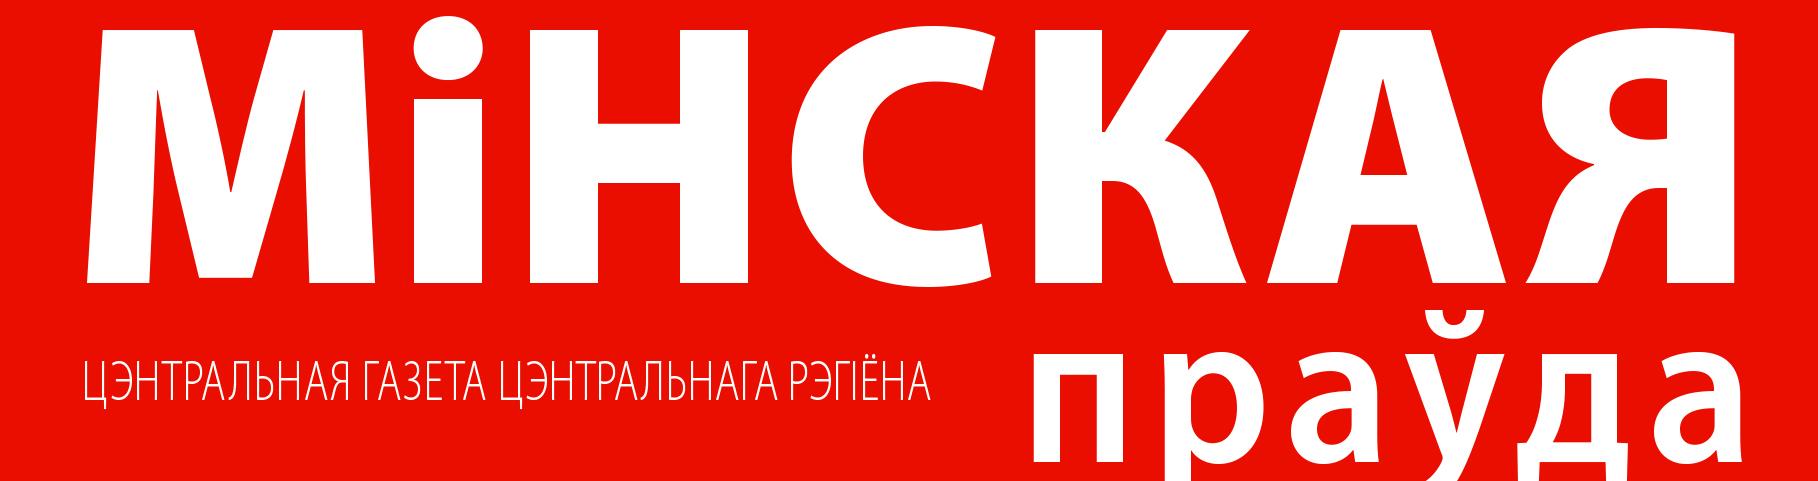 рекламное агентство реклама-он reklama-on.by минская правда газета